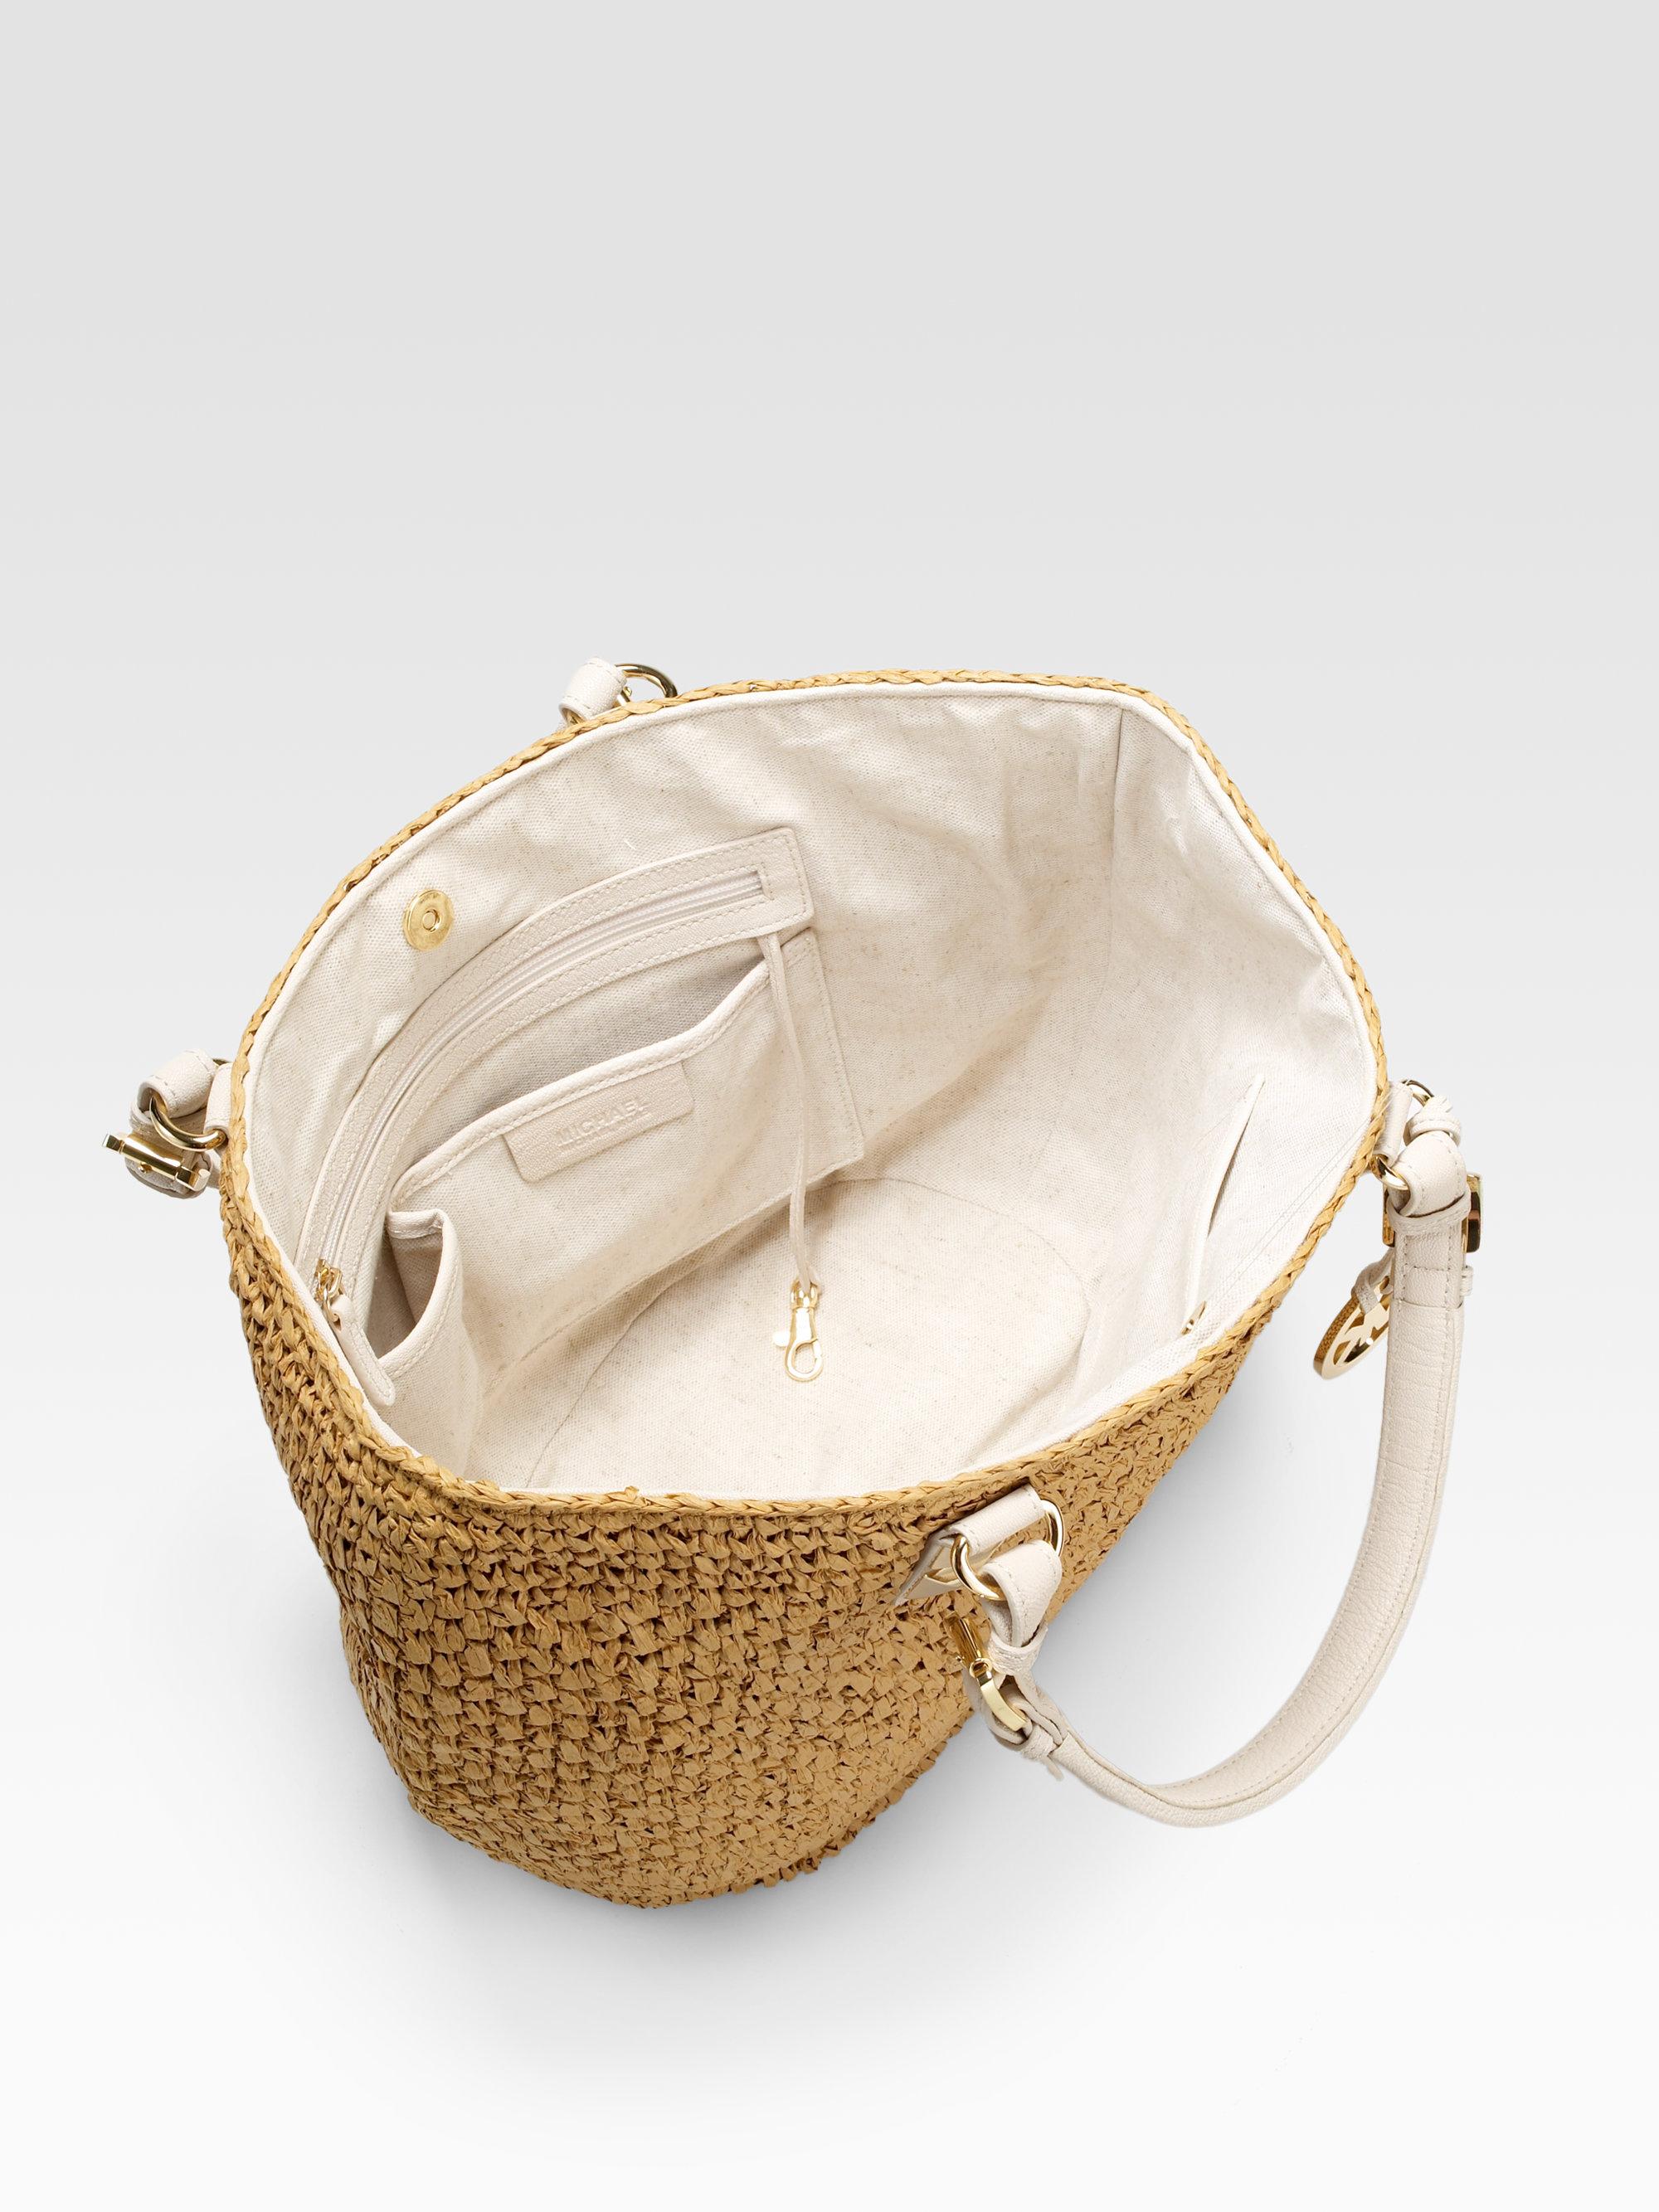 1b545b0f484d Michael Kors Straw Handbag - Foto Handbag All Collections ...